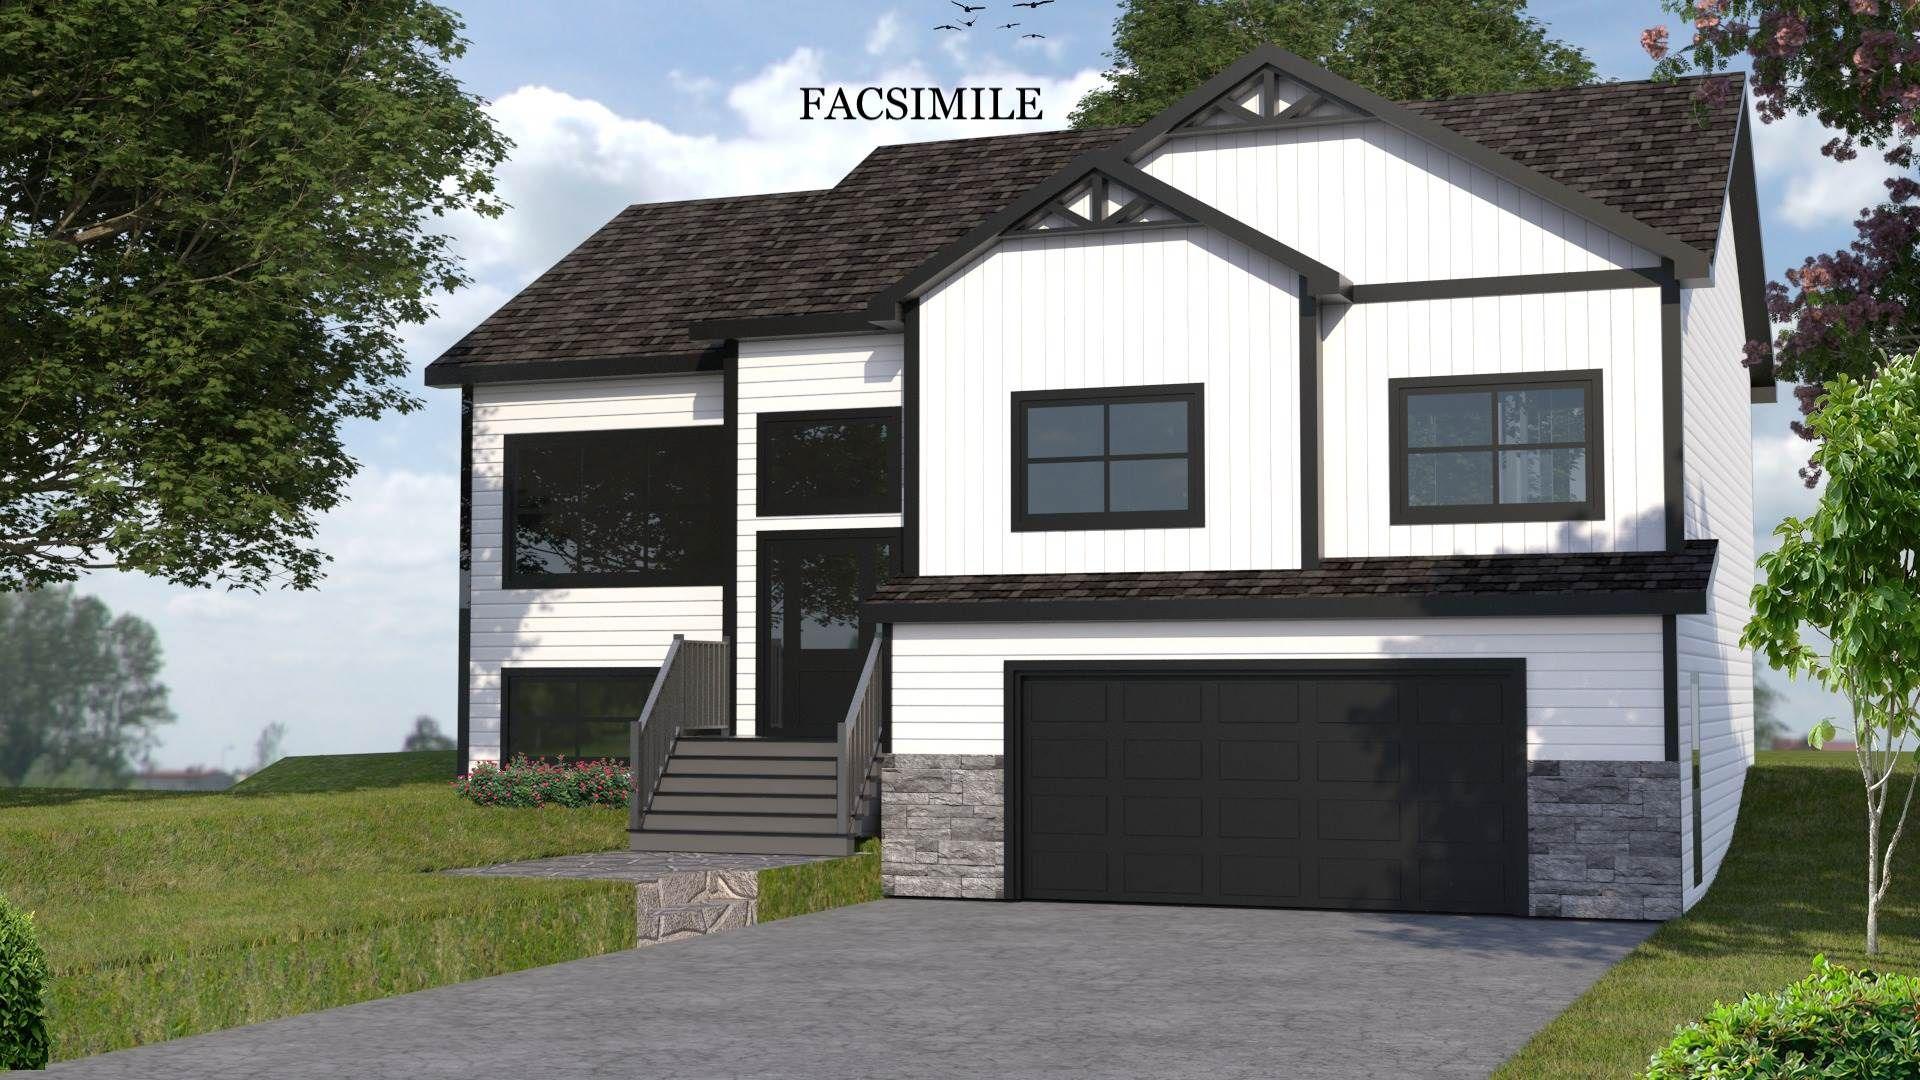 Main Photo: Lot 295 841 McCabe Lake in Middle Sackville: 26-Beaverbank, Upper Sackville Residential for sale (Halifax-Dartmouth)  : MLS®# 202108747